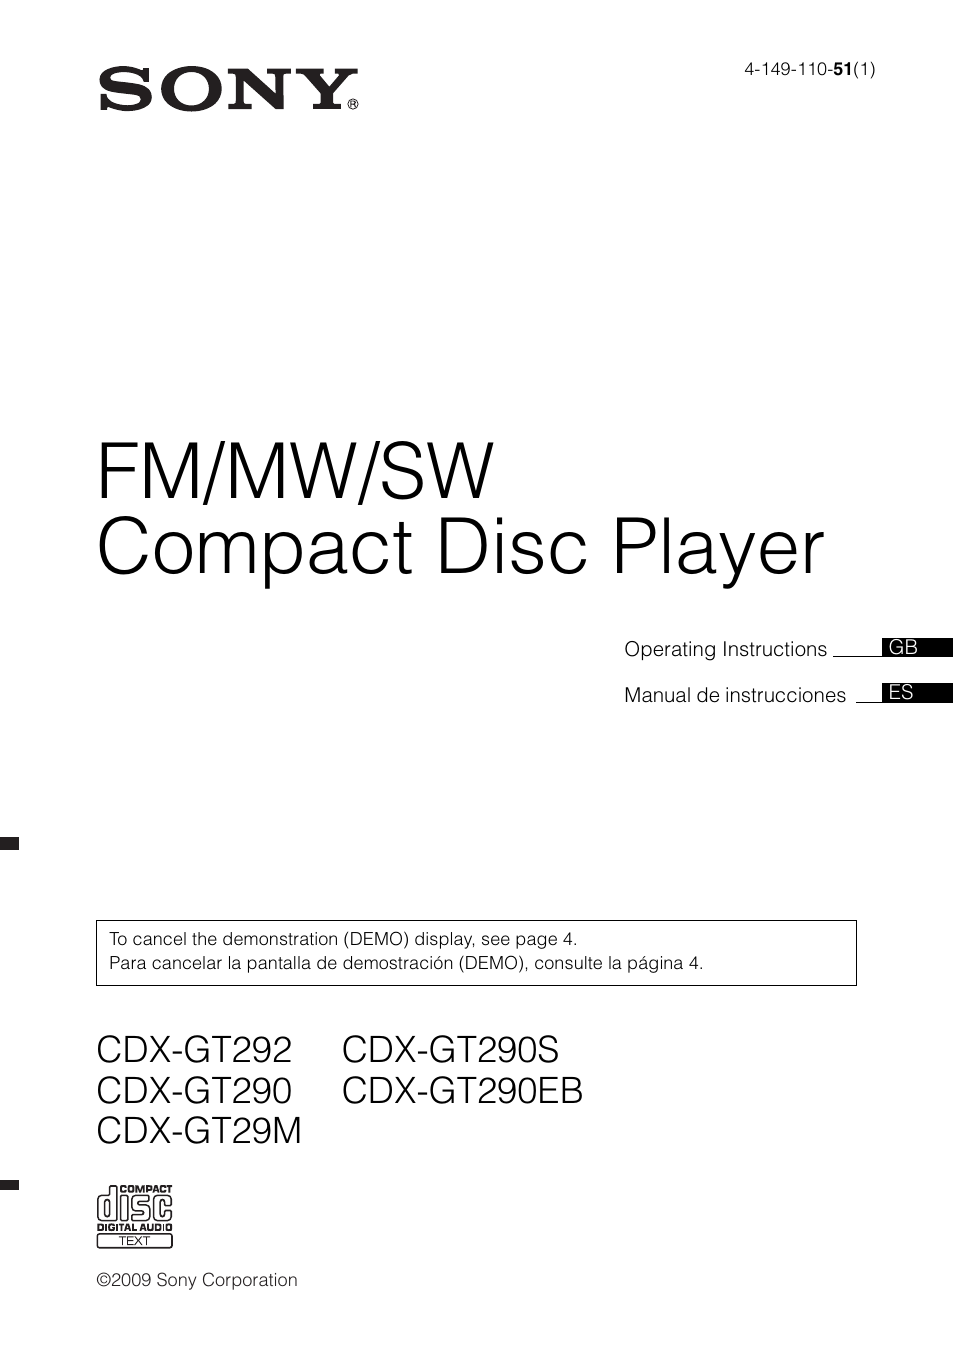 Wiring Diagram Sony Cdx Gt290